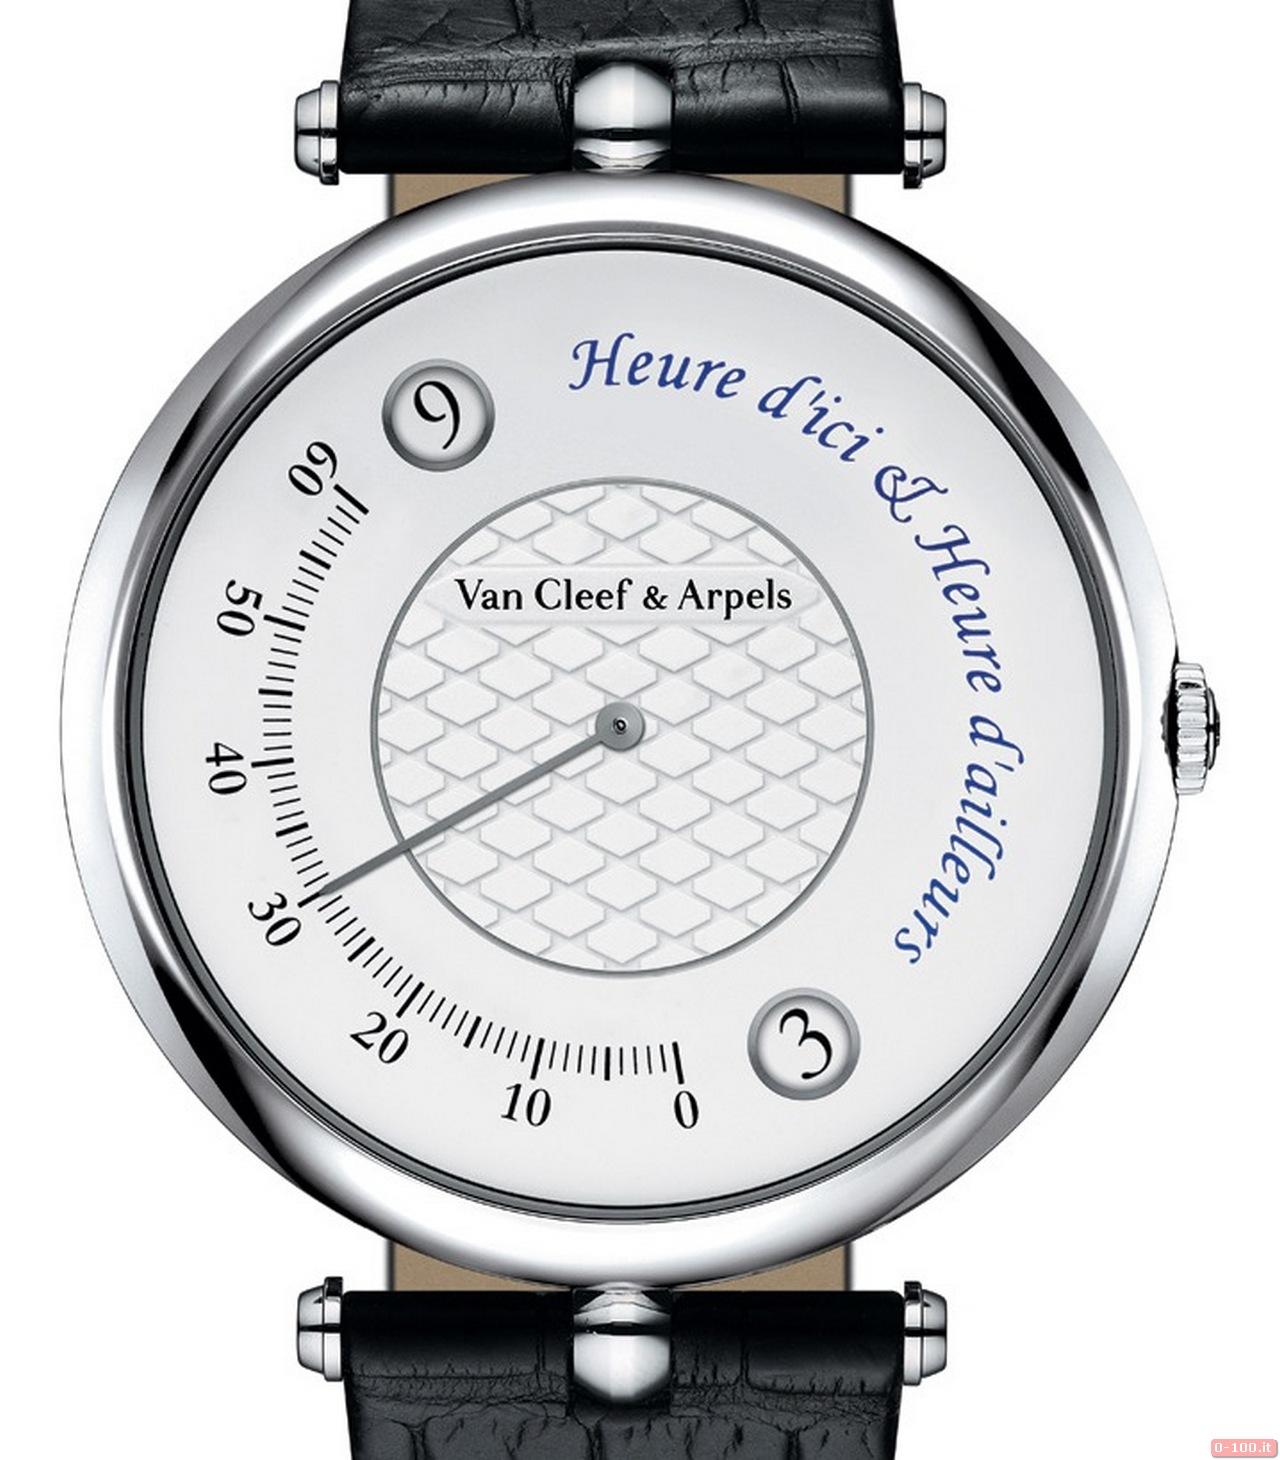 sihh-2014-van-cleef-arpels-heure-dici-heure-dailleurs-prezzo-price_0-1002